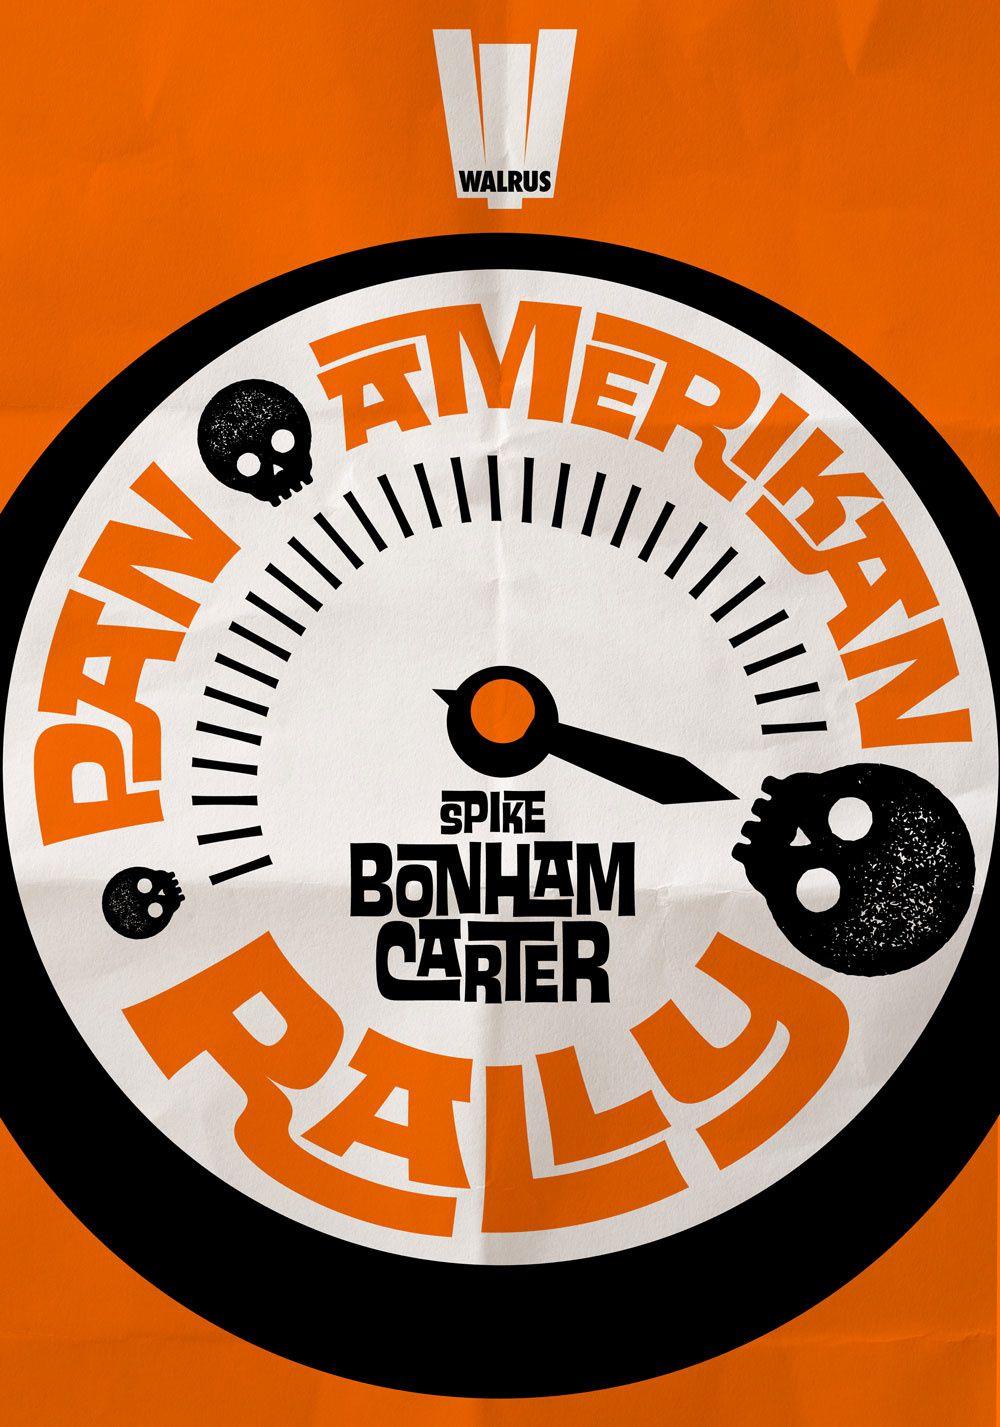 Pan-Amerikan Rally de Spike Bonham-Carter